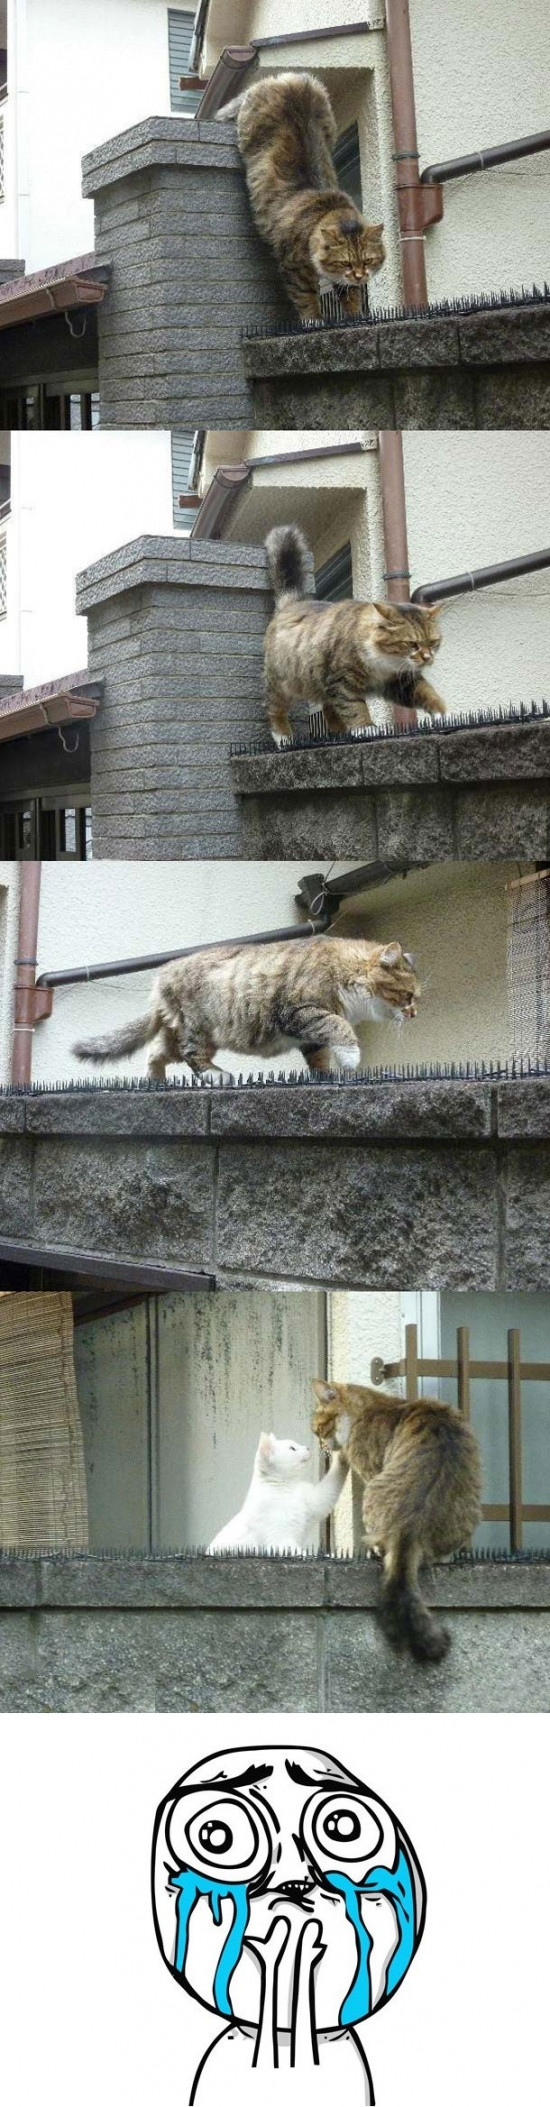 Cute cat visiting his girlfriend in spite of adversity - Imgur